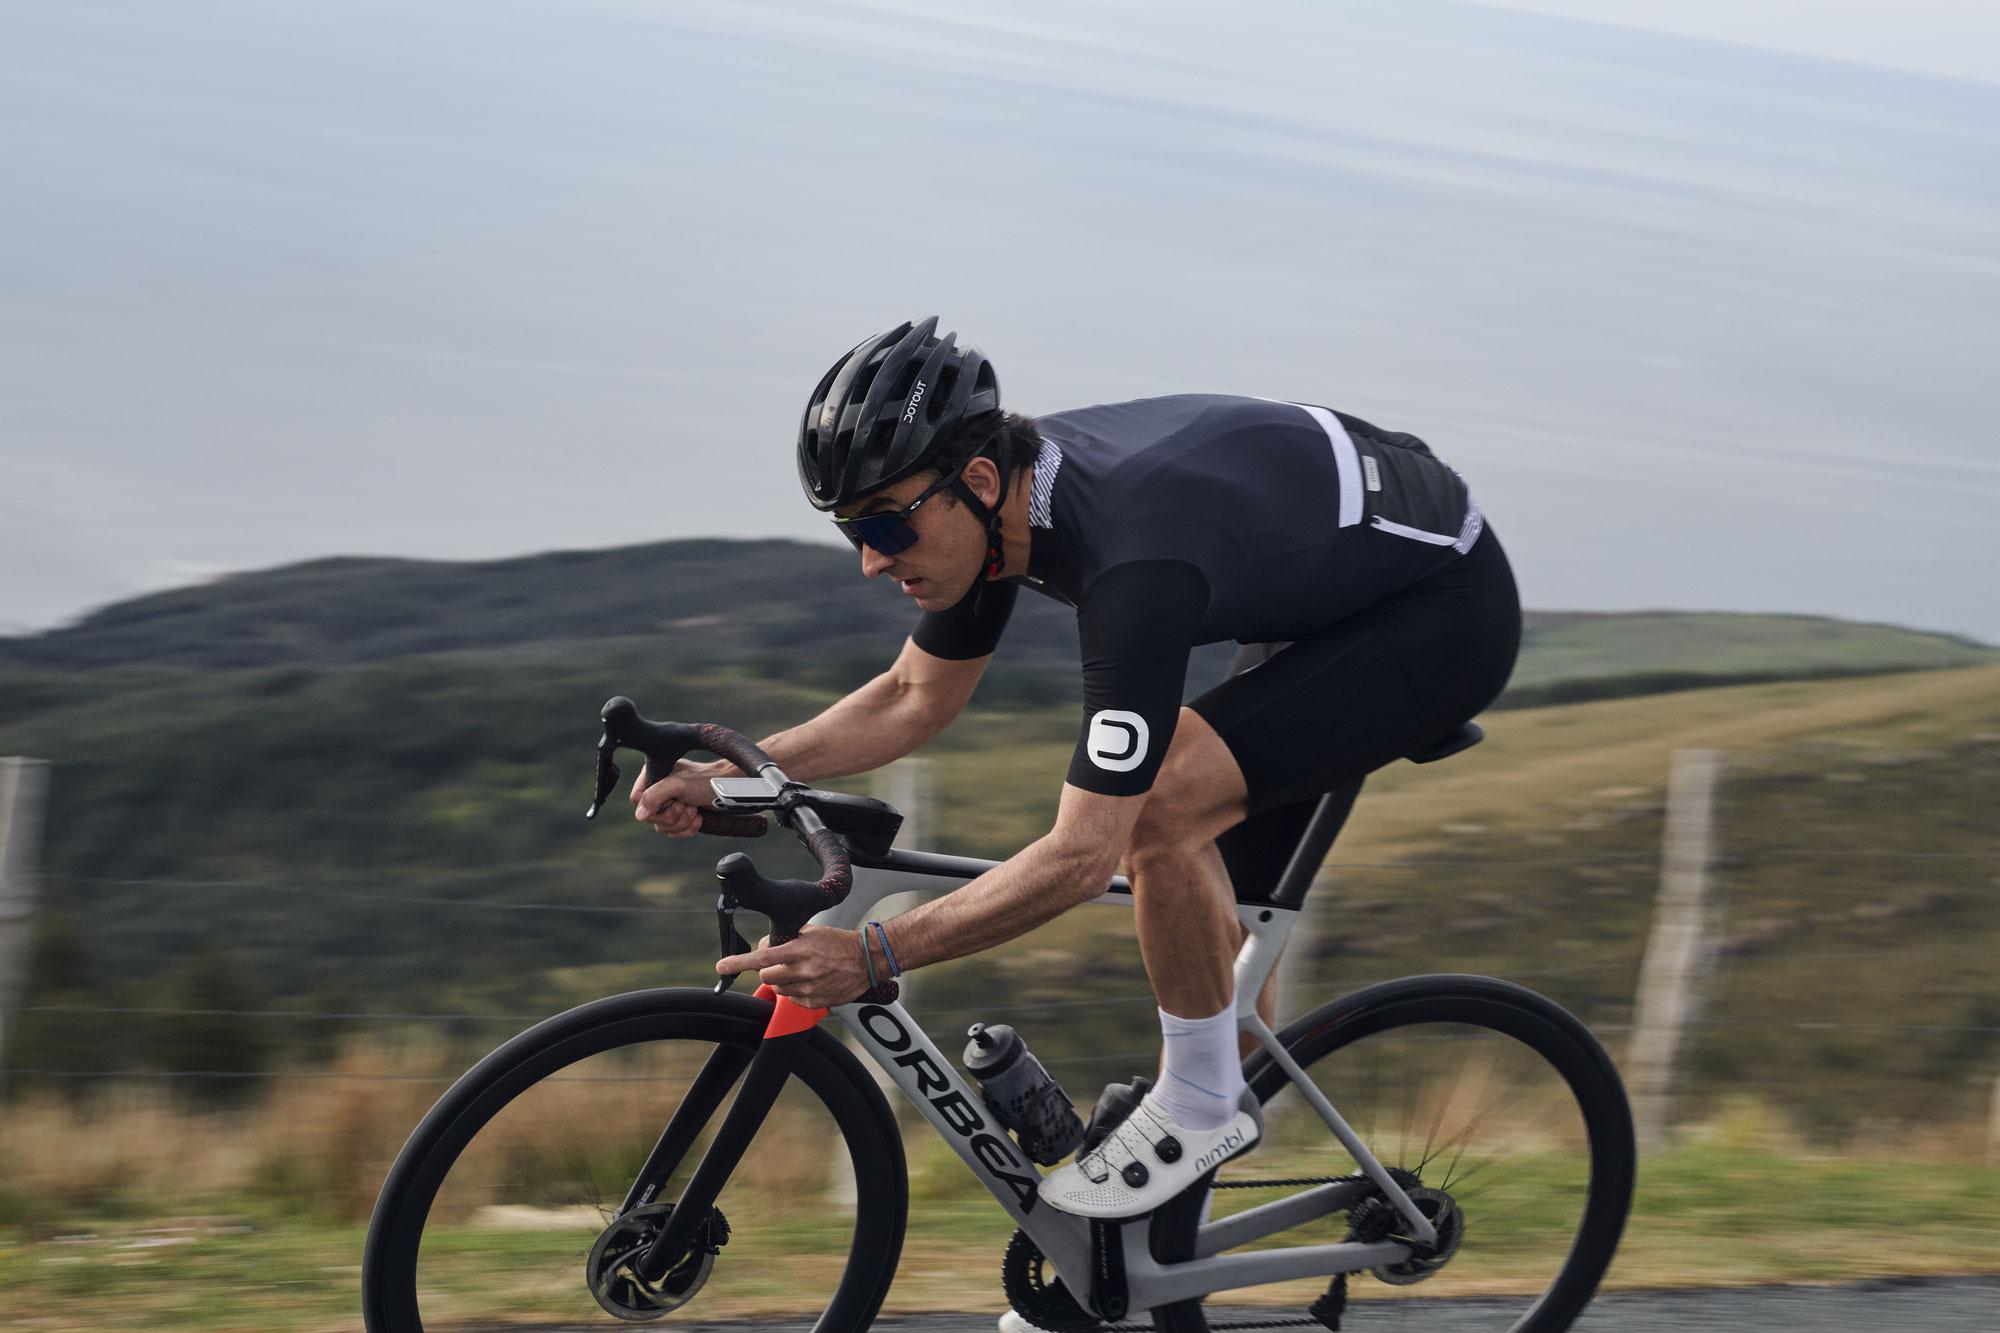 Trendbewusste Funktionalität: Das Dotout Ride Jersey mit Polartec Power Dry